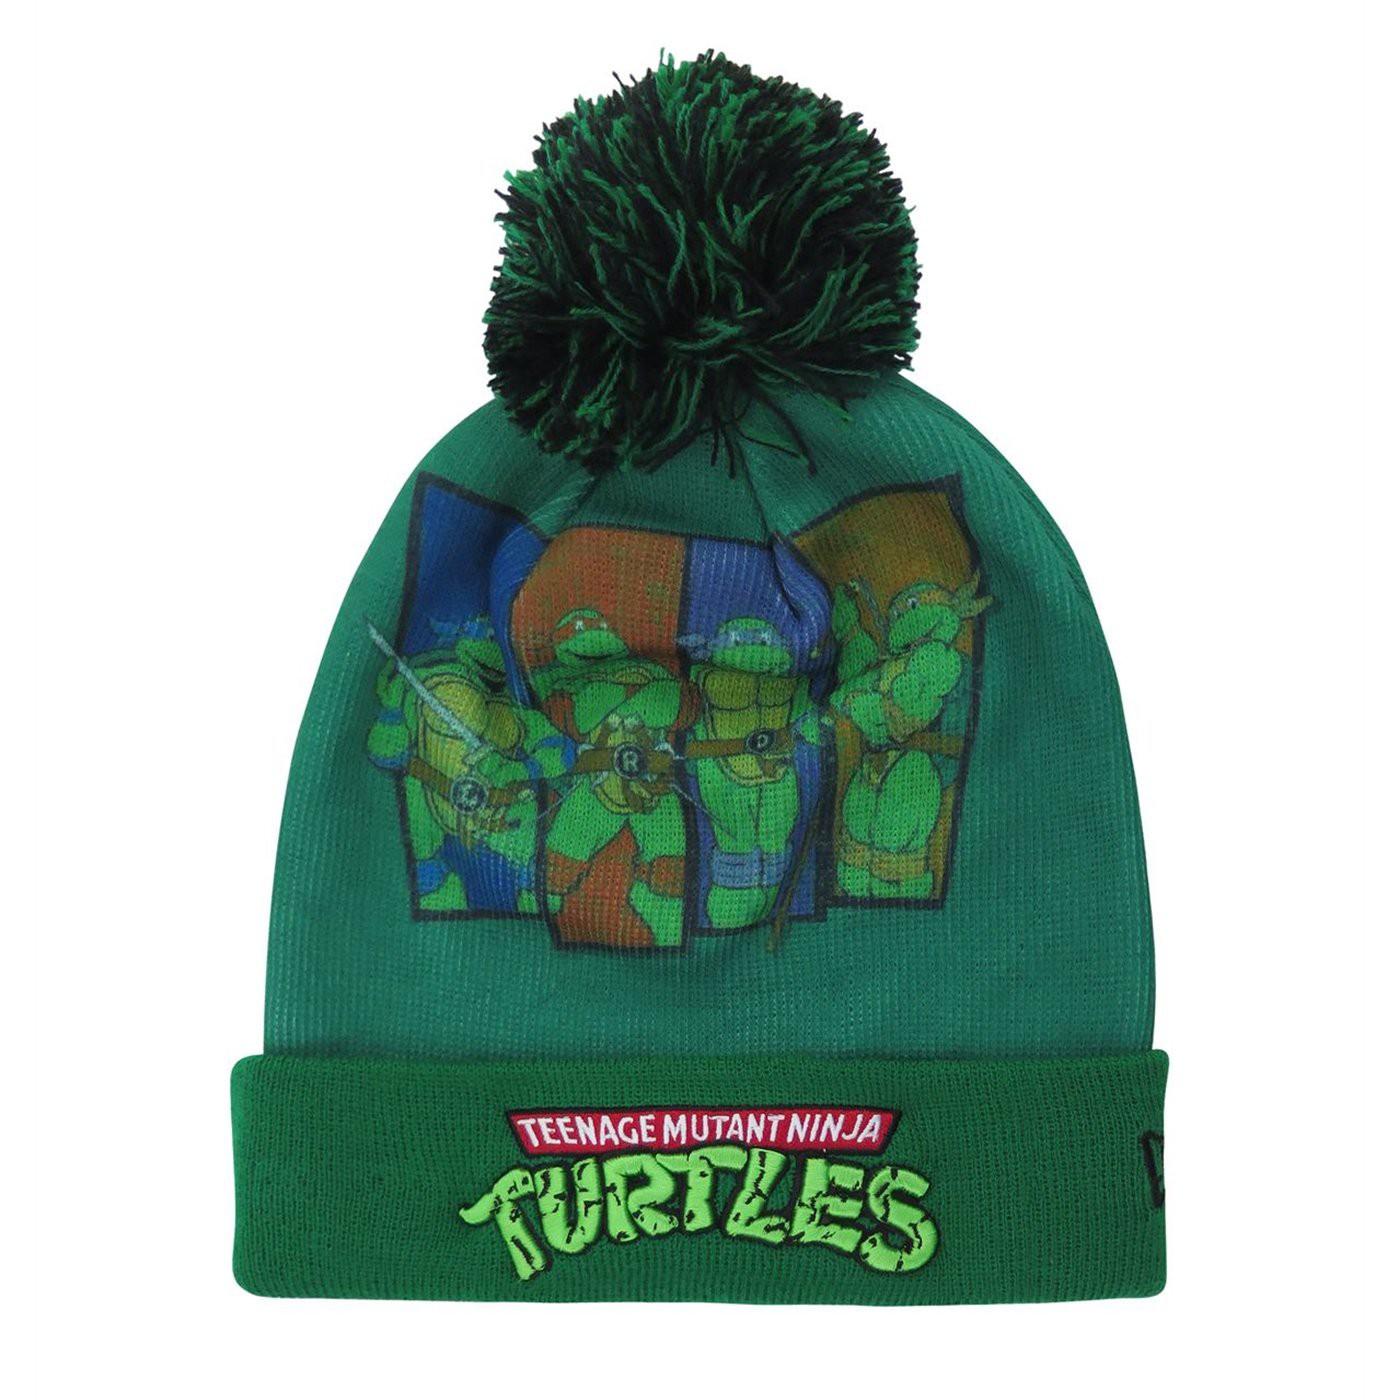 Teenage Mutant Ninja Turtles Kids Pom Pom Youth Beanie